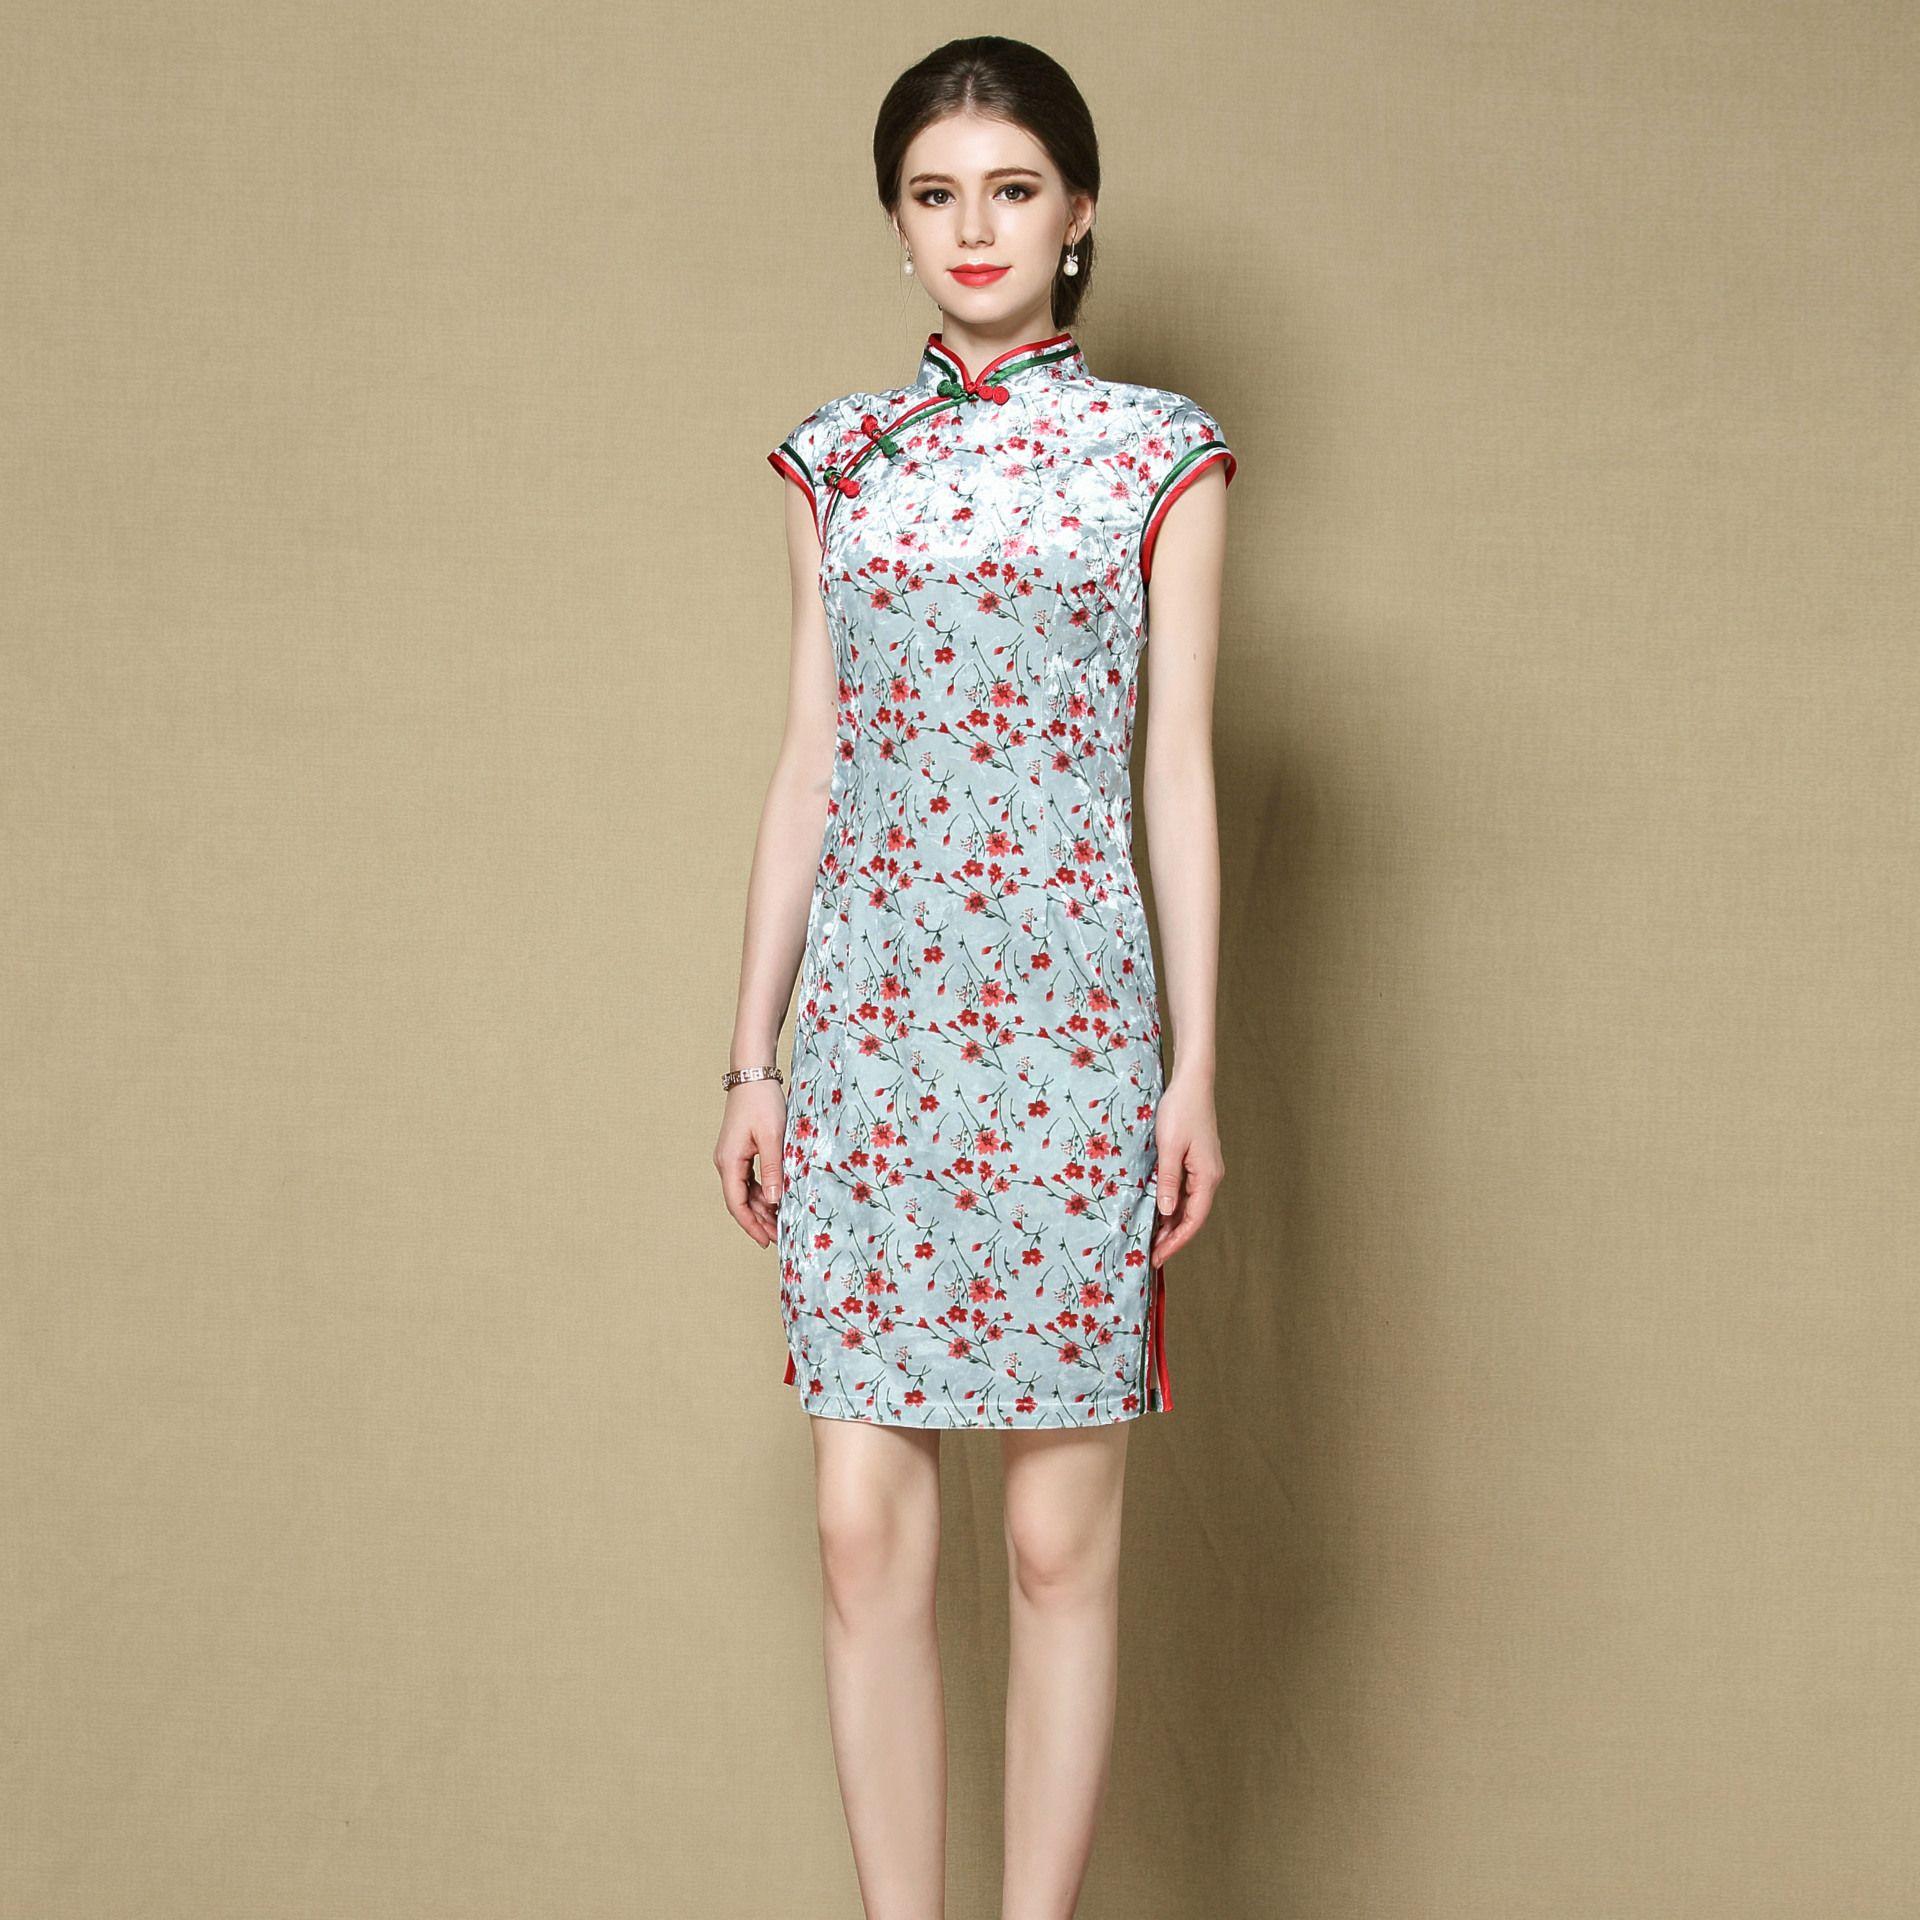 Cute Small Flowers Velvet Qipao Cheongsam Dress - Blue